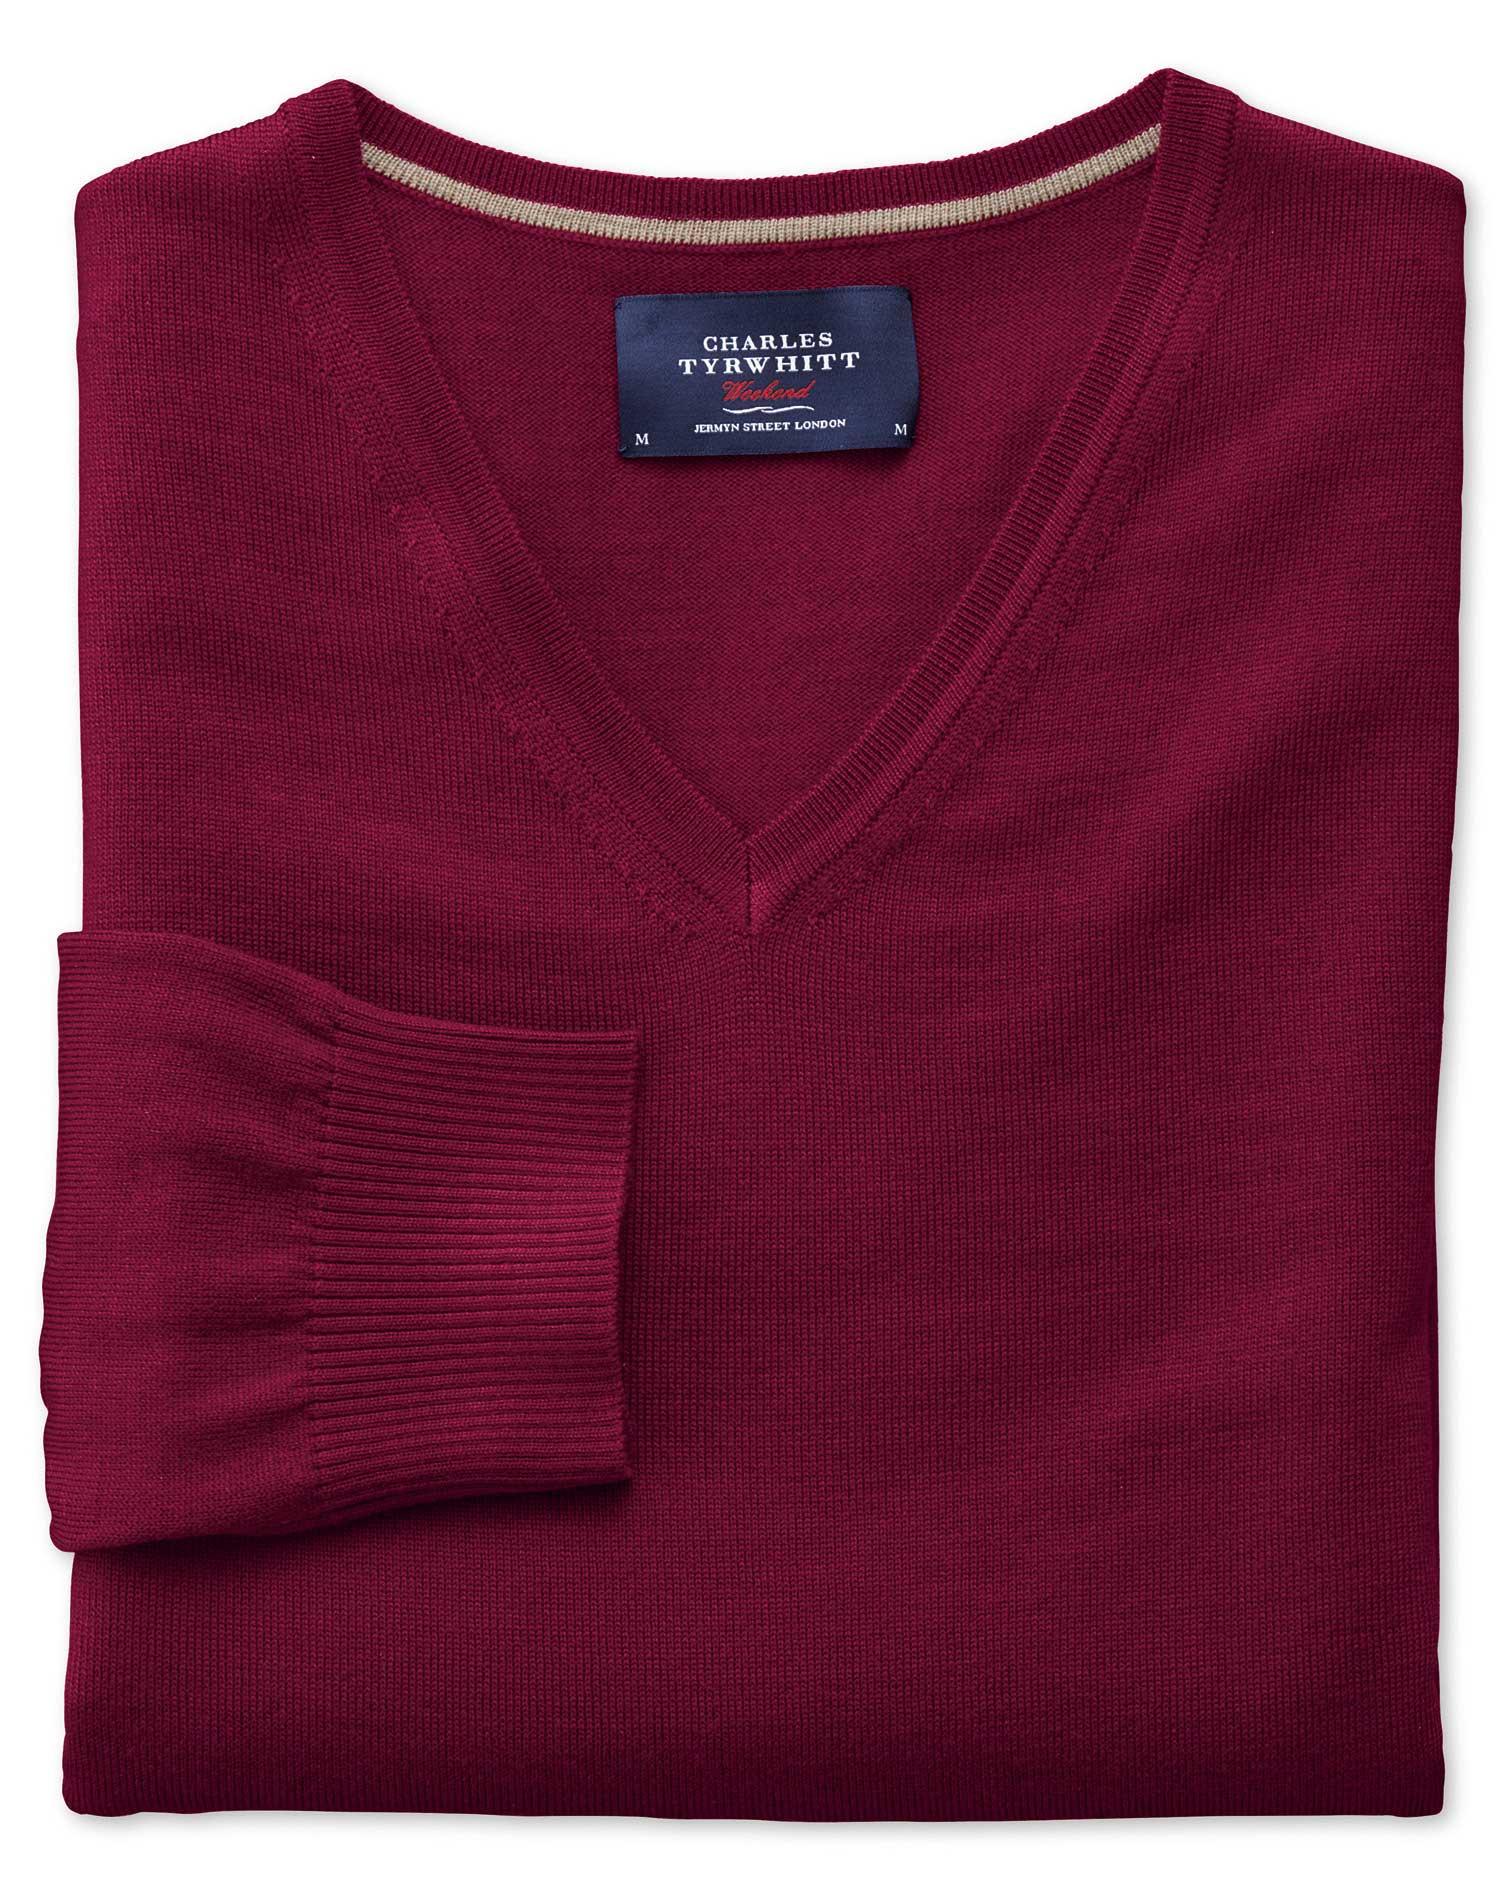 Dark Red Merino Wool V-Neck Jumper Size XXL by Charles Tyrwhitt